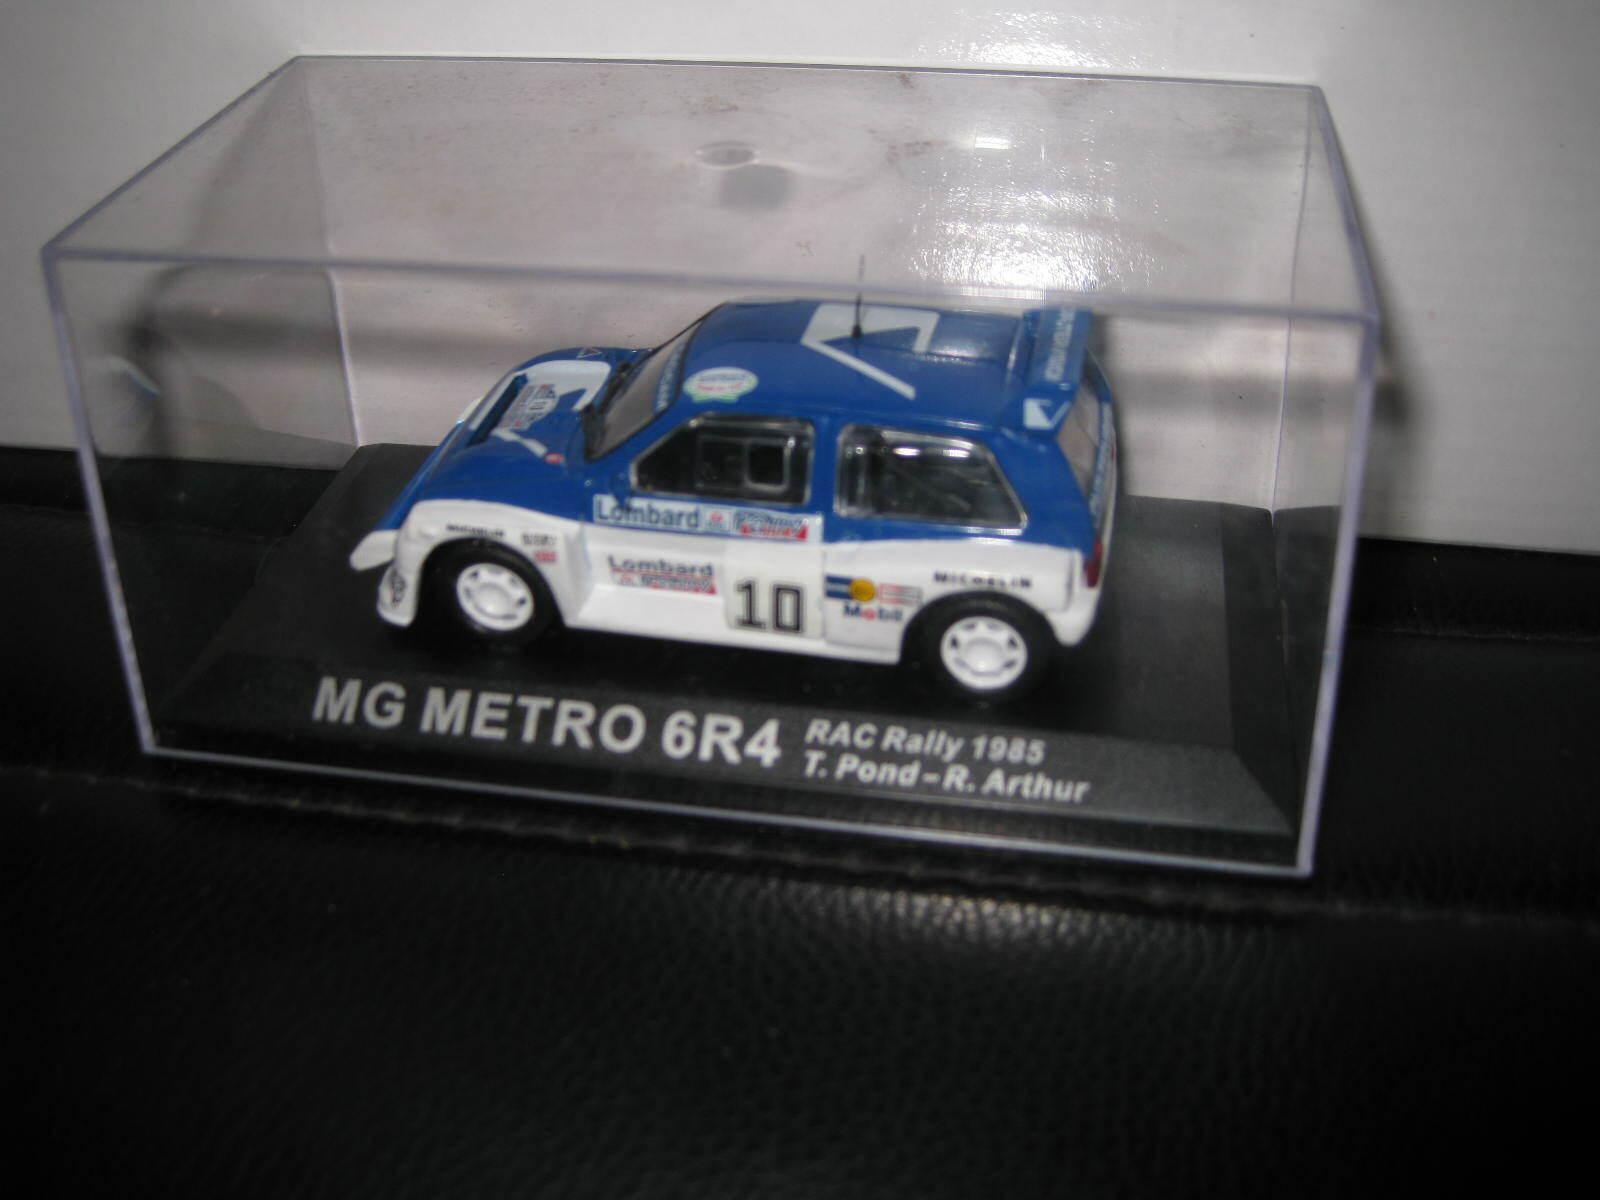 IXO ALTAYA MG METRO 6R4 #15 RAC RALLY 1986